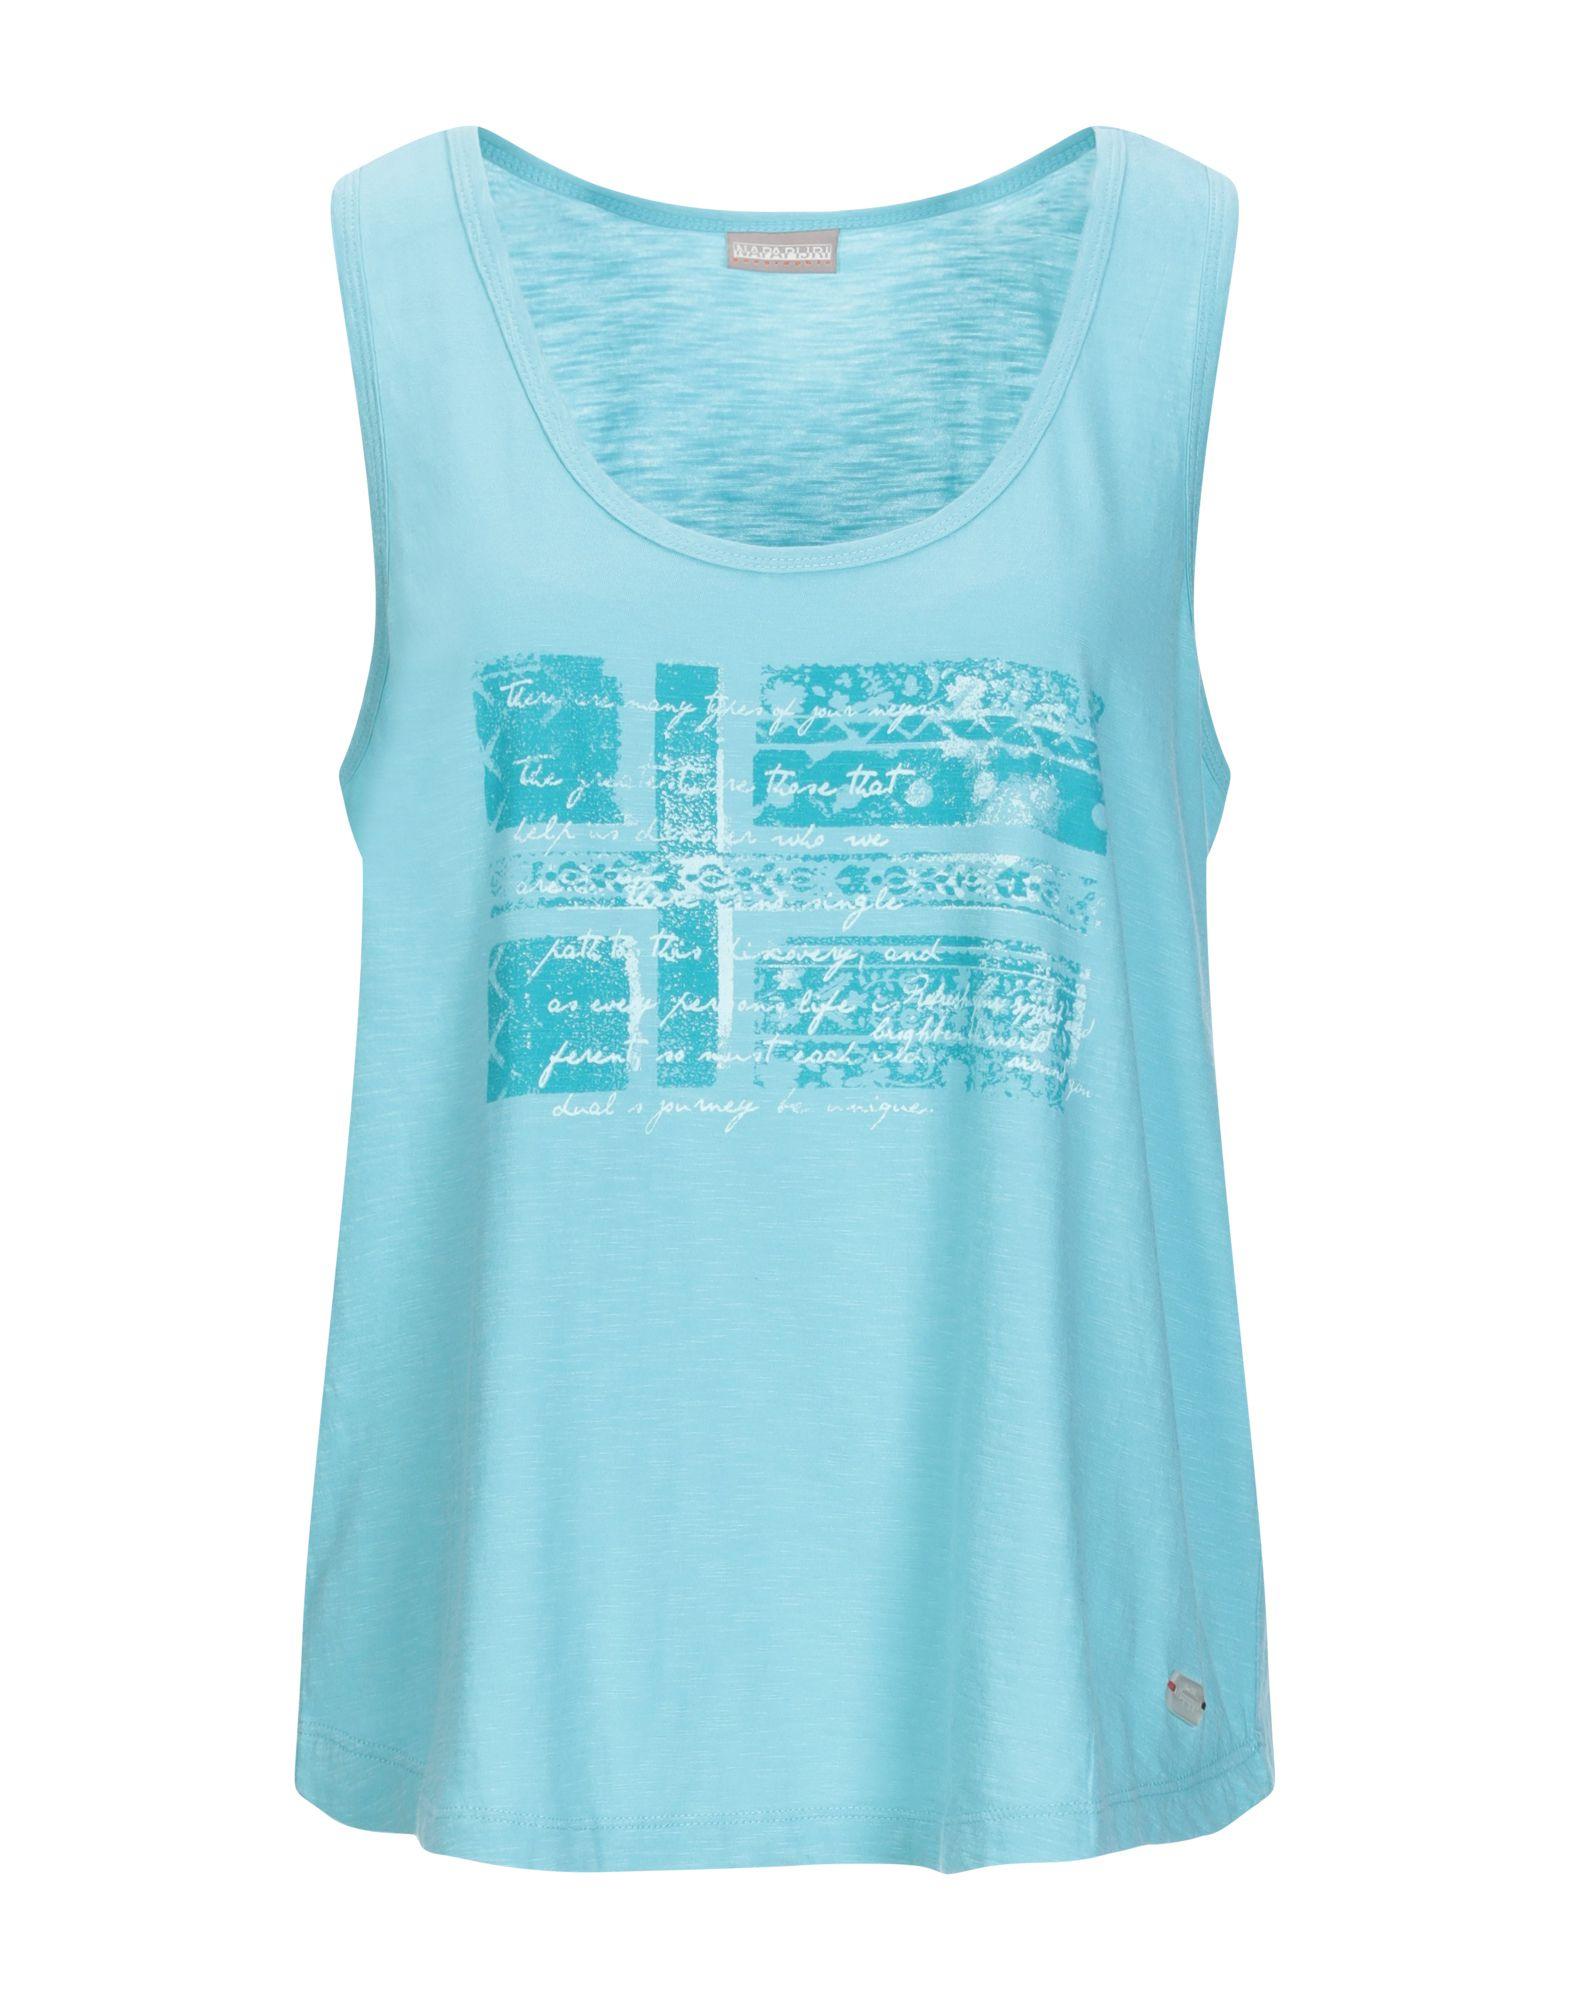 NAPAPIJRI Tank tops. jersey, print, logo, solid color, round collar, sleeveless, no pockets. 100% Cotton